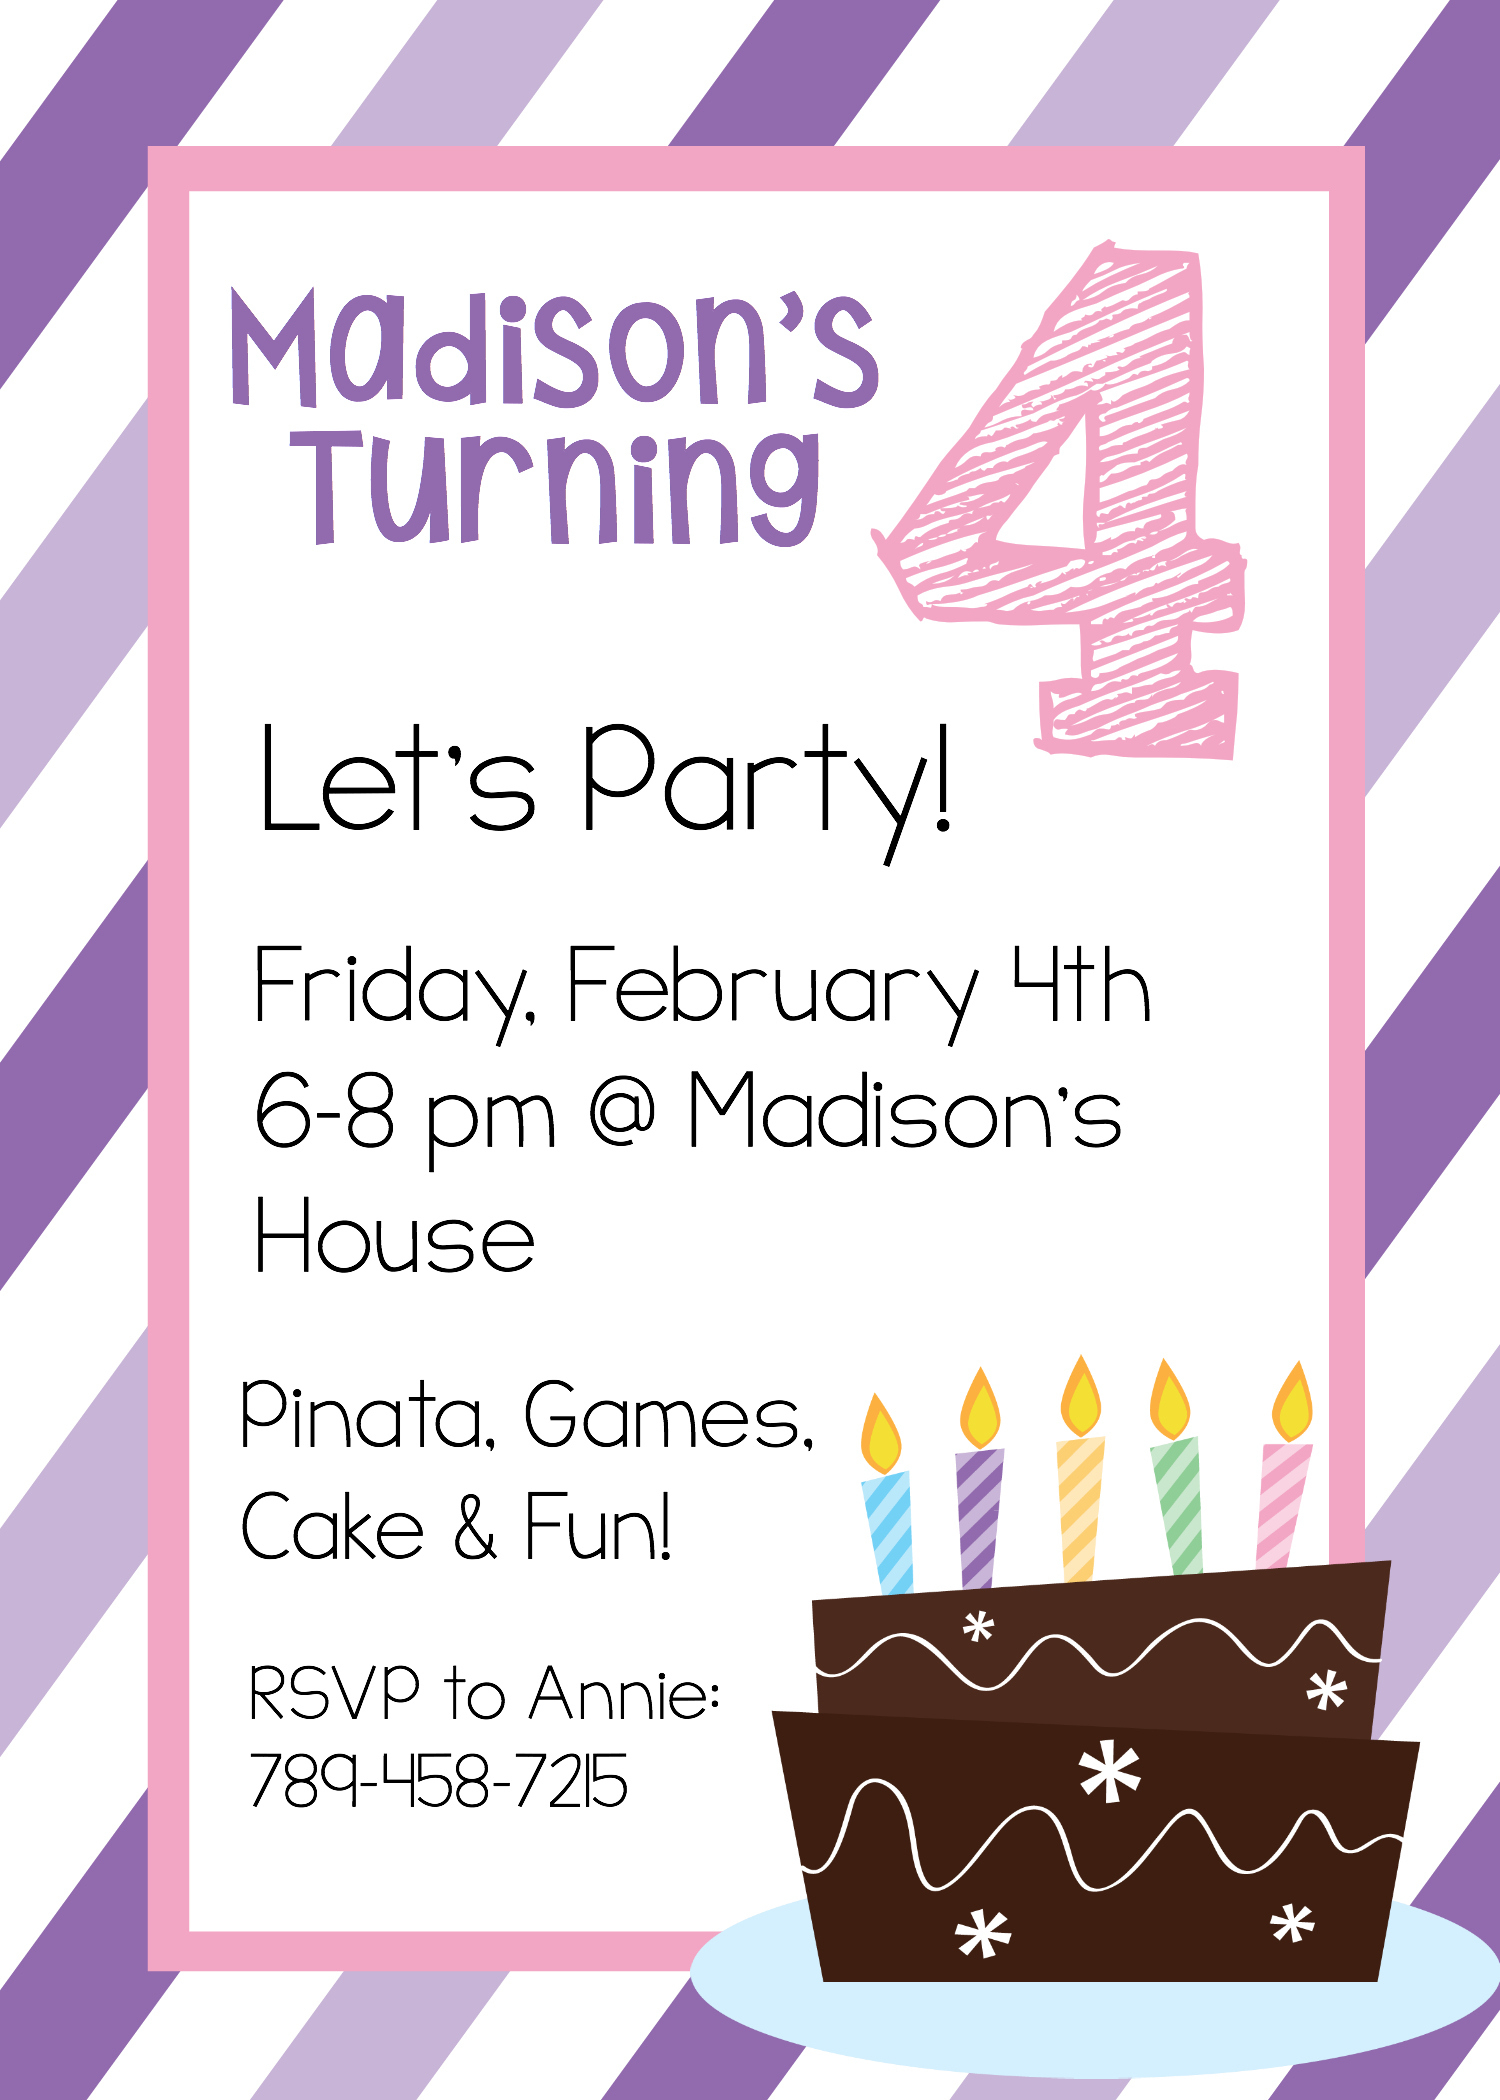 Free Printable Birthday Invitation Templates - Birthday Party Invitations Online Free Printable